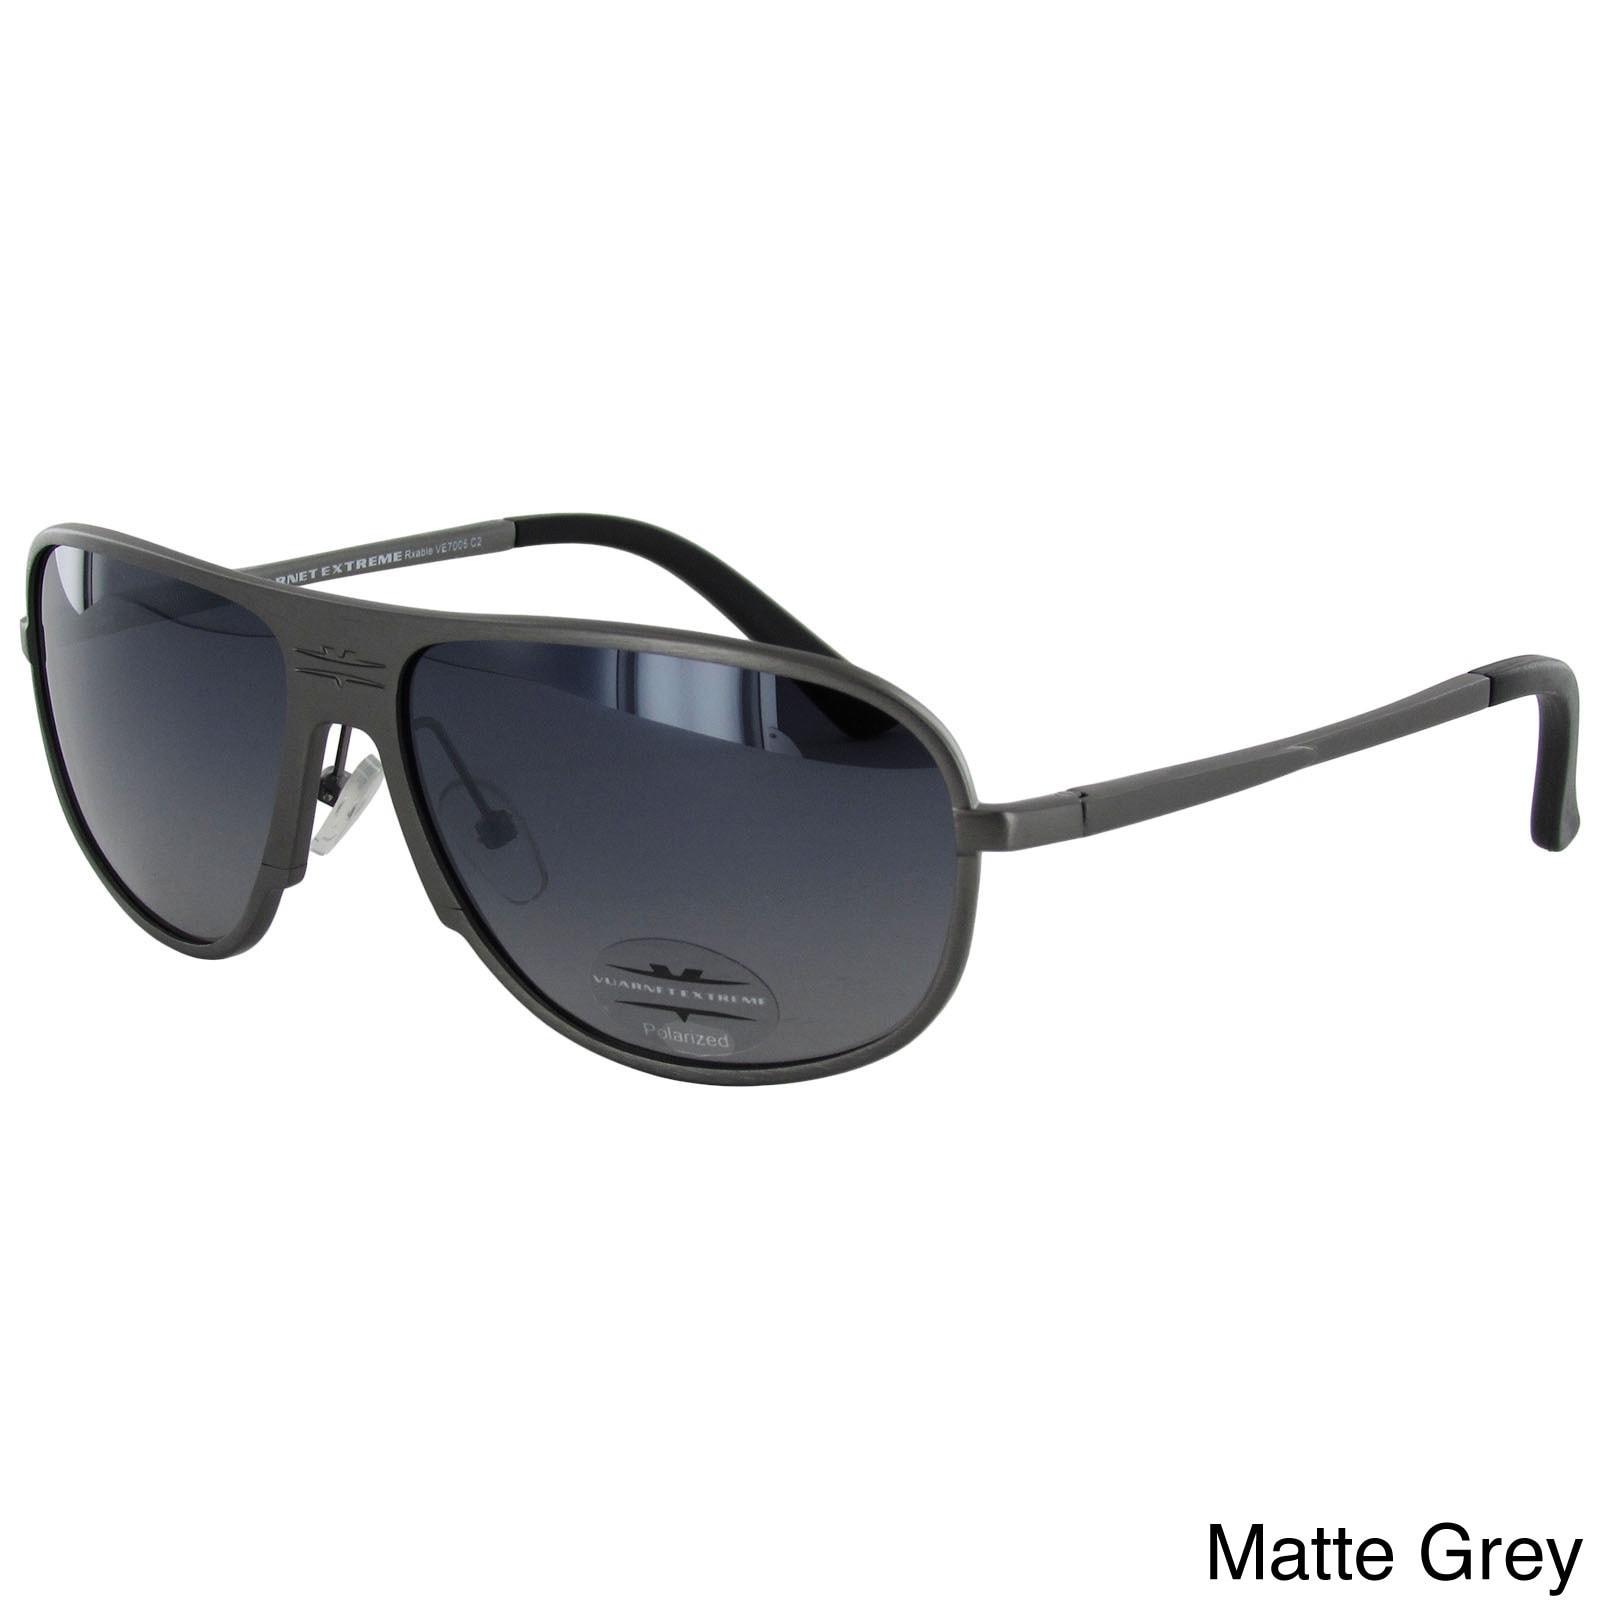 Polarized Vuarnet Extreme 7005 Aviator Sunglasses rCtxsQhd